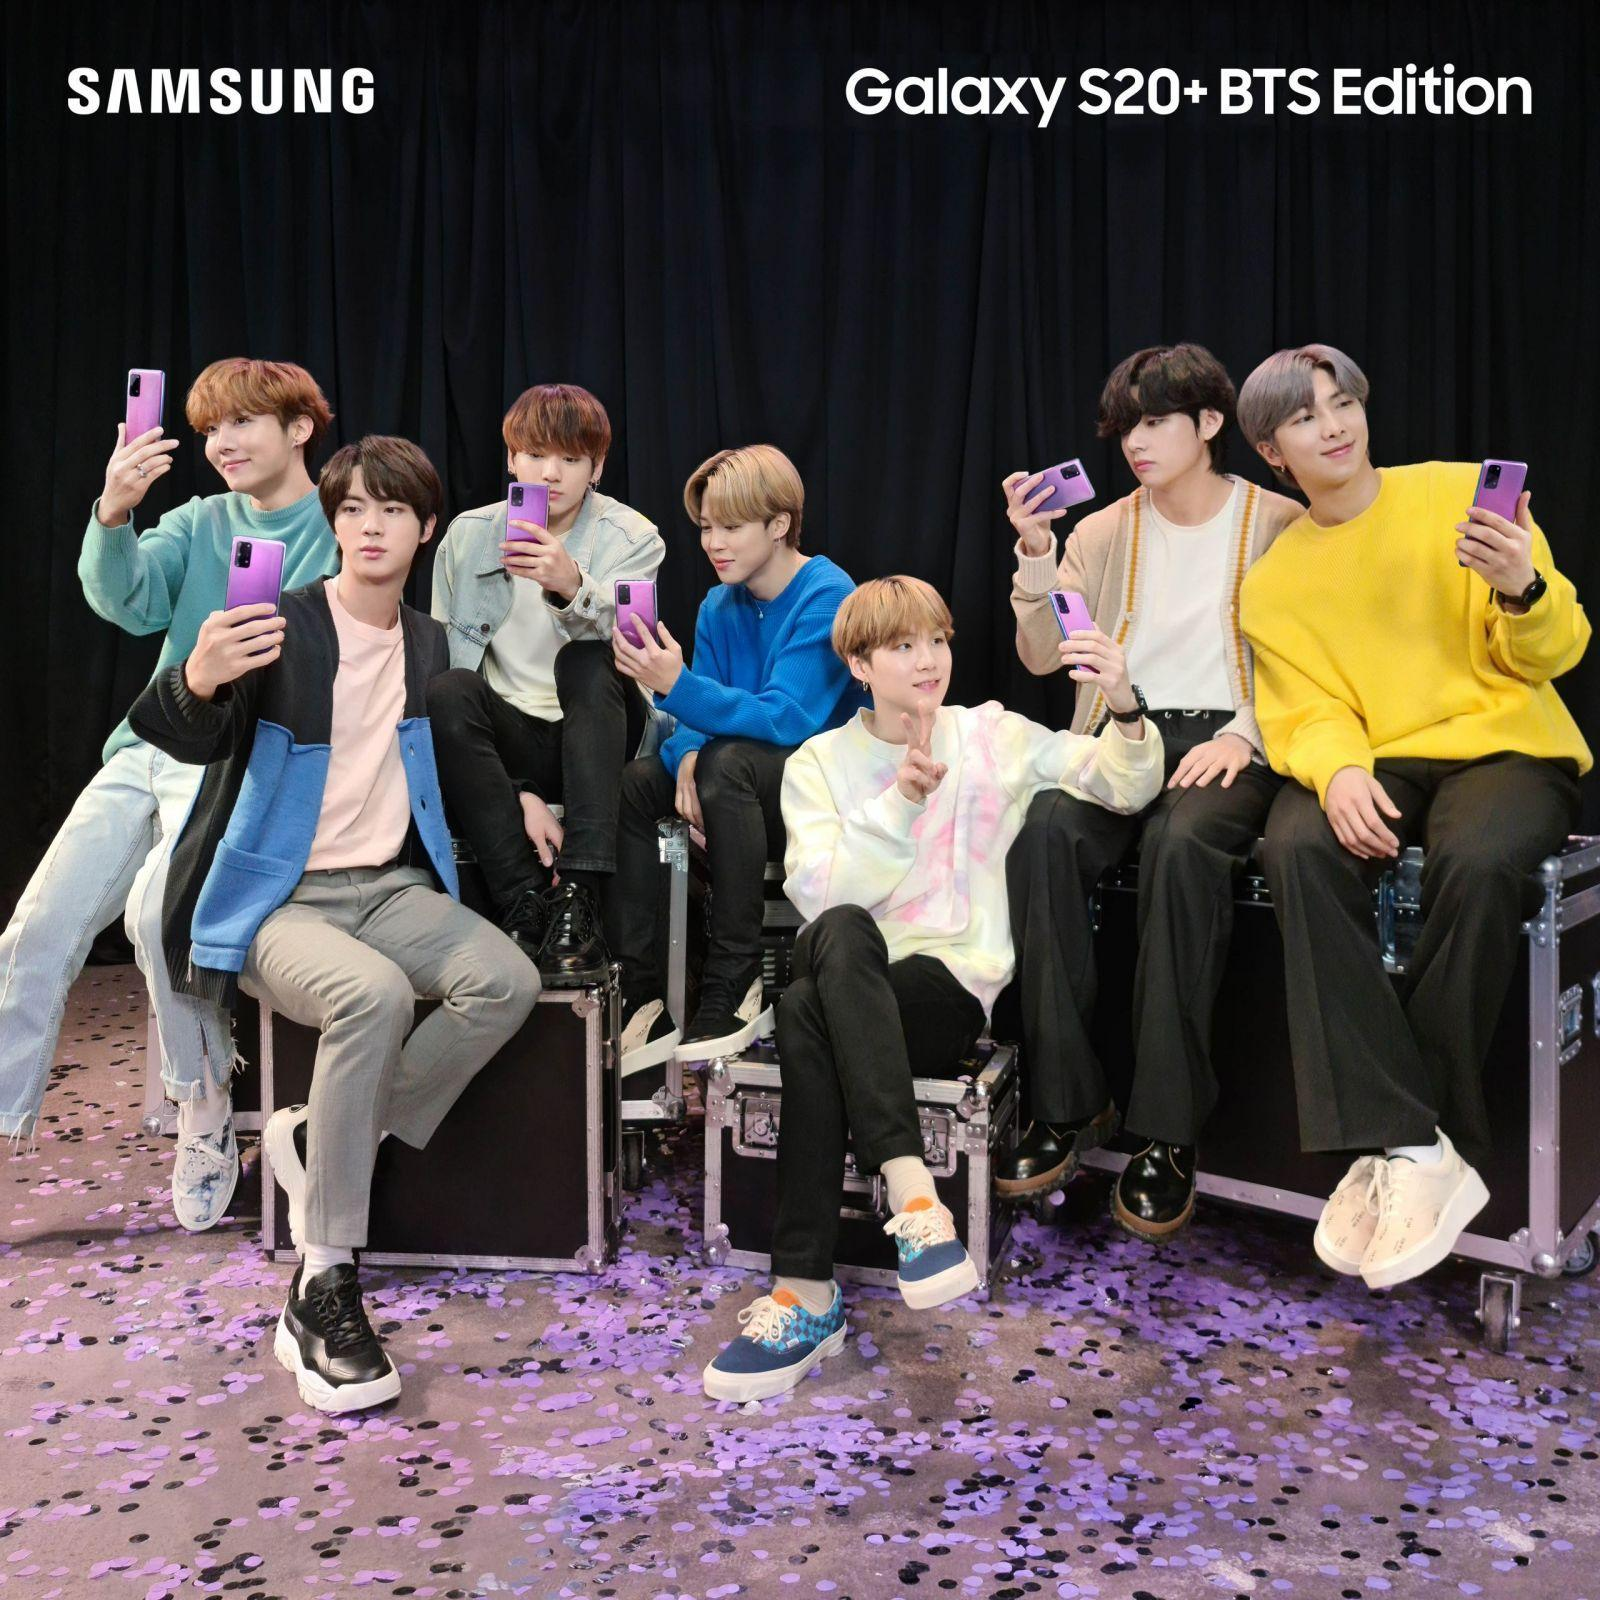 Samsung представляет Galaxy S20+ и Galaxy Buds+ BTS Edition (01 galaxy s20plus bts edition lifestyle kv 1x1 min scaled)